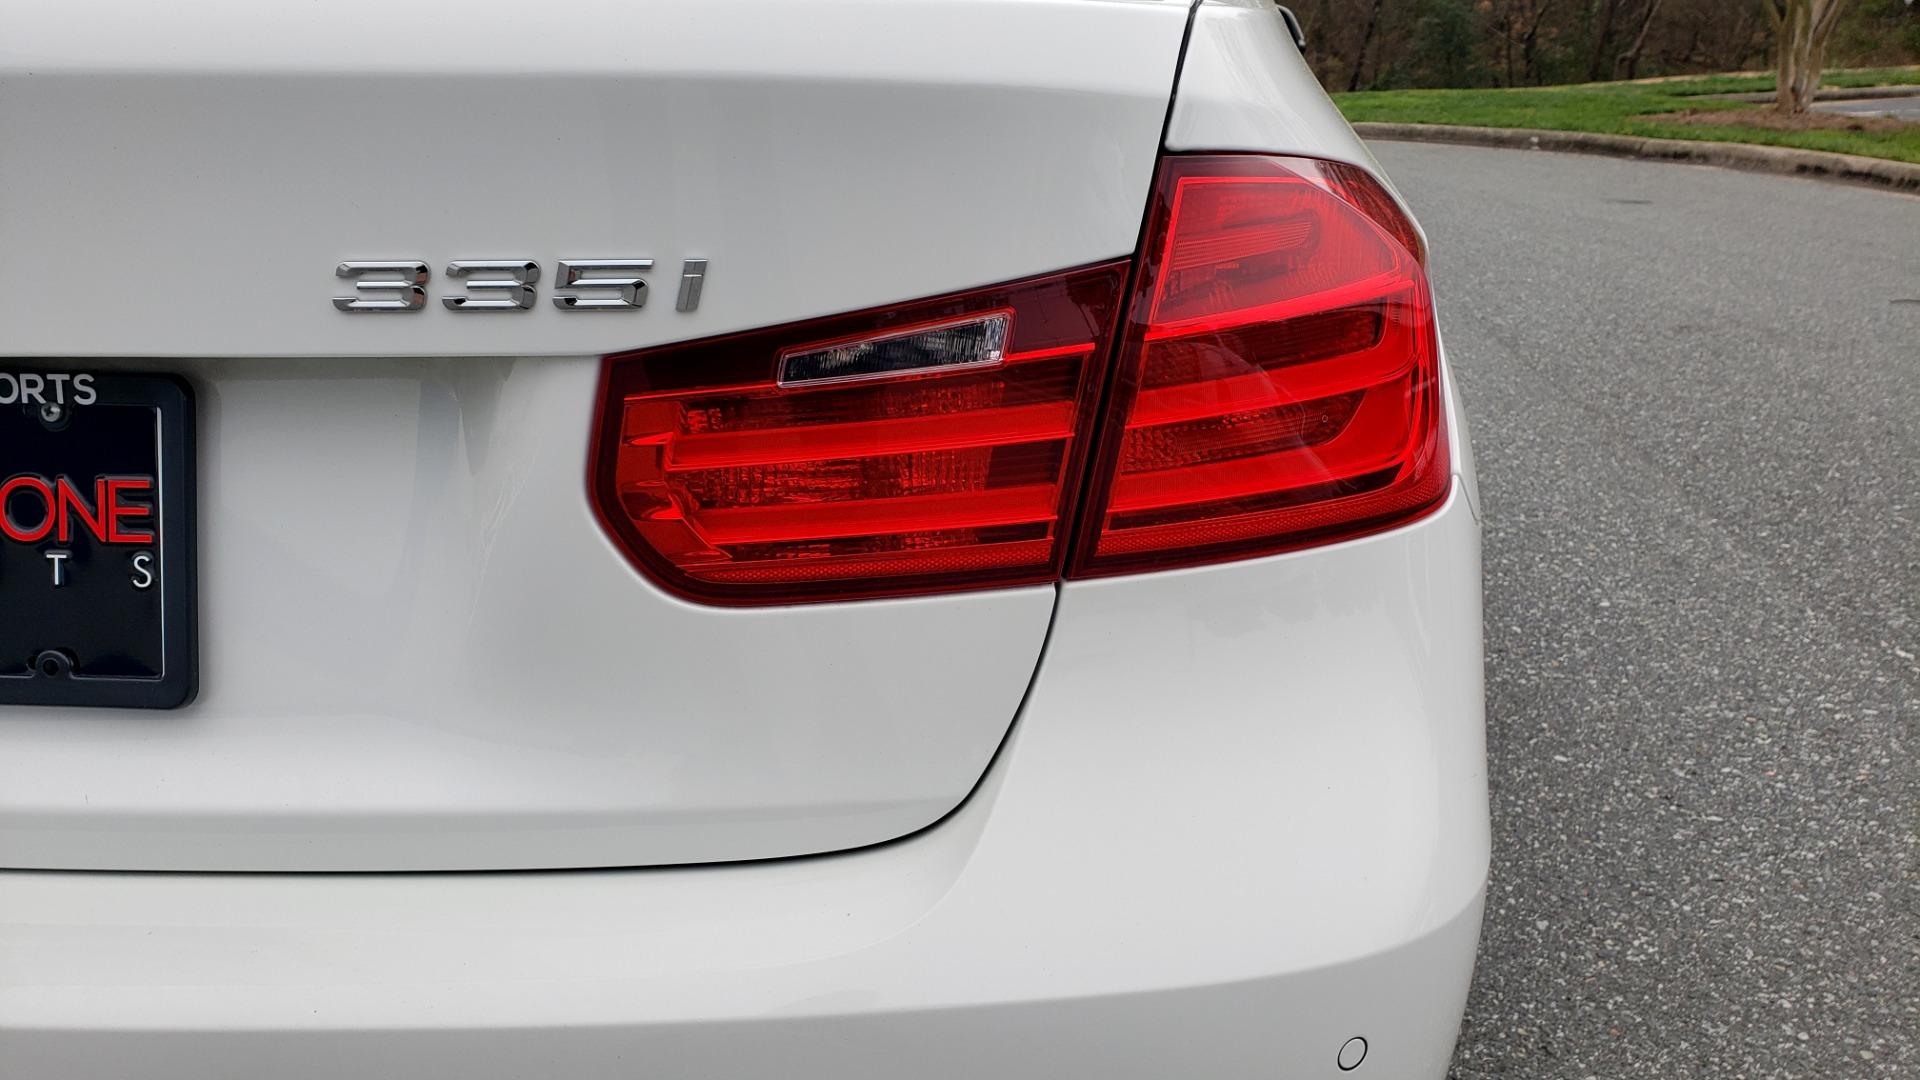 Used 2015 BMW 3 Series 335I M-SPORT / PREM PKG / HK SND / SUNROOF / REARVIEW for sale Sold at Formula Imports in Charlotte NC 28227 30